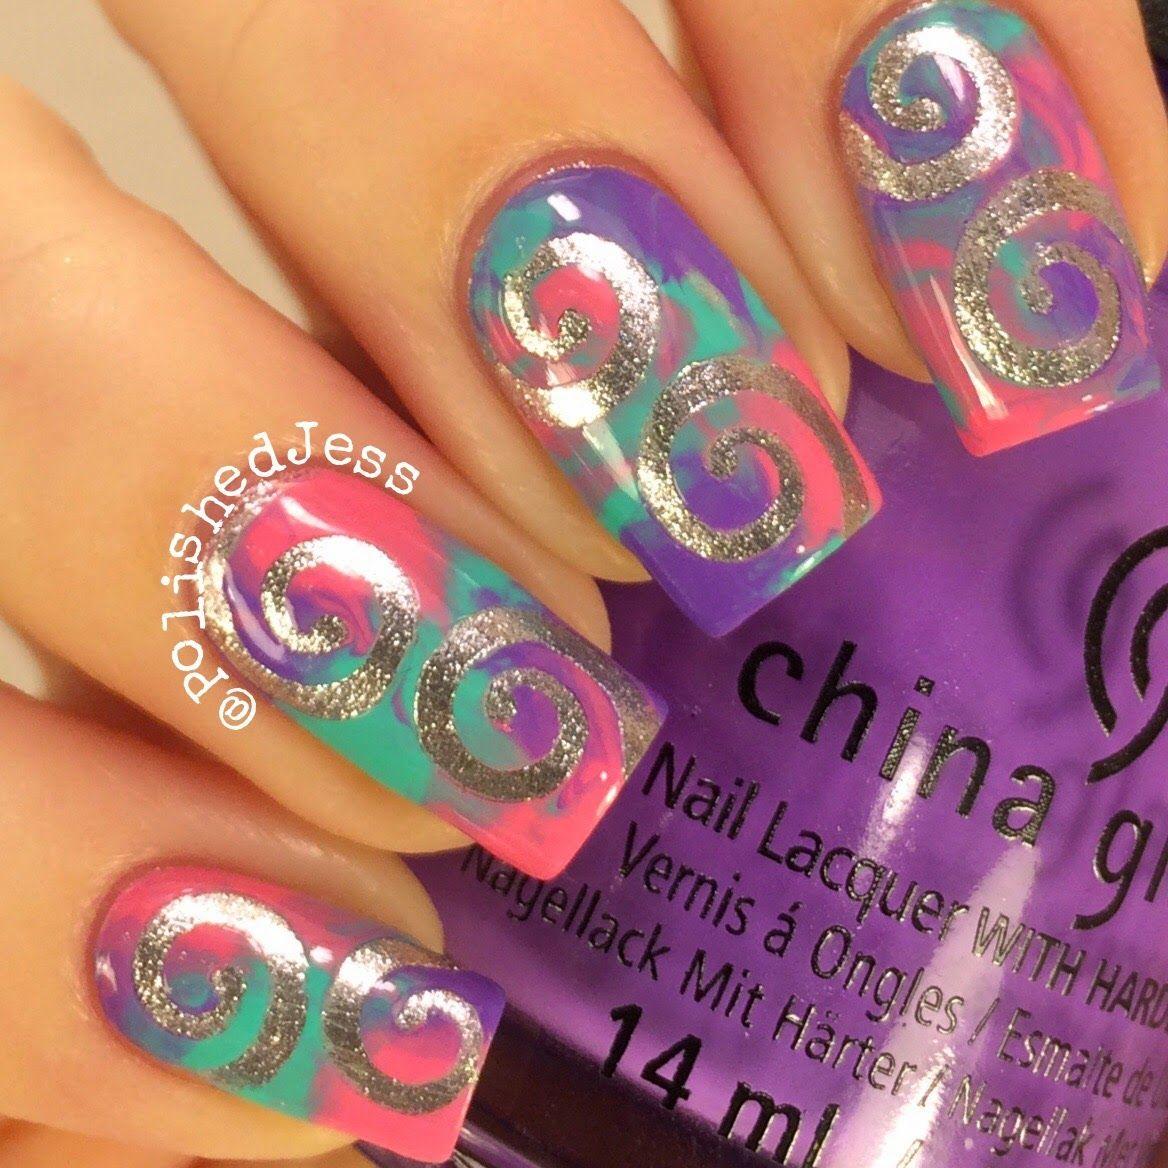 Twinkledt nail art